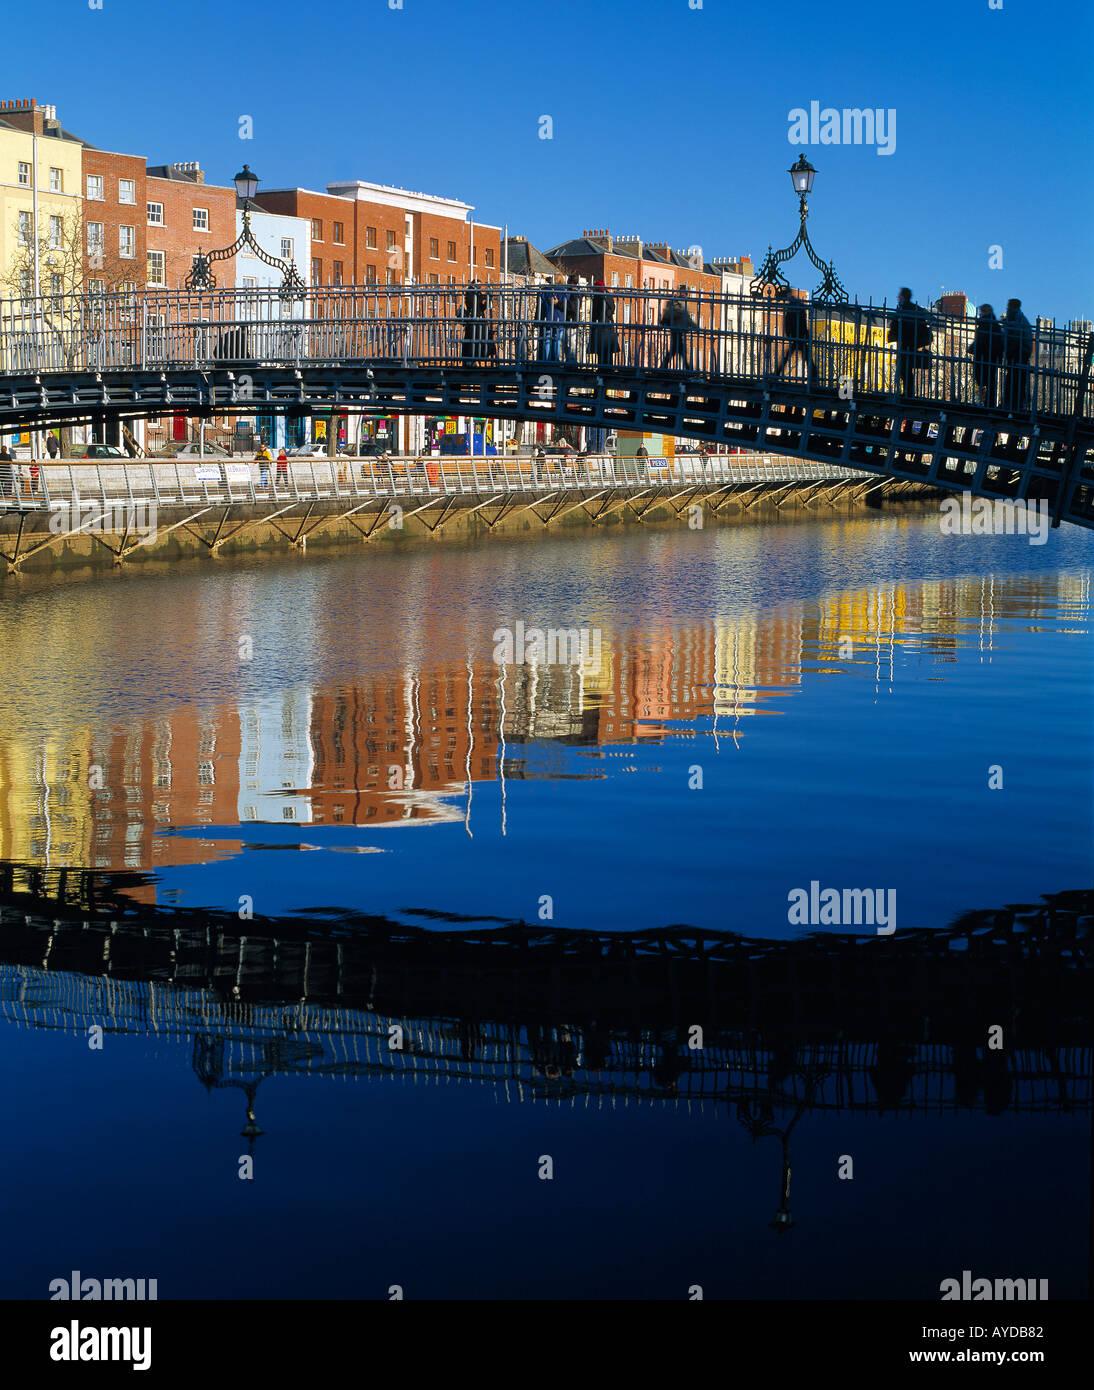 1/2 half penny bridge river liffey, dublin ireland, old narrow pedestrian walk  historic bridge over irelands river liffey - Stock Image